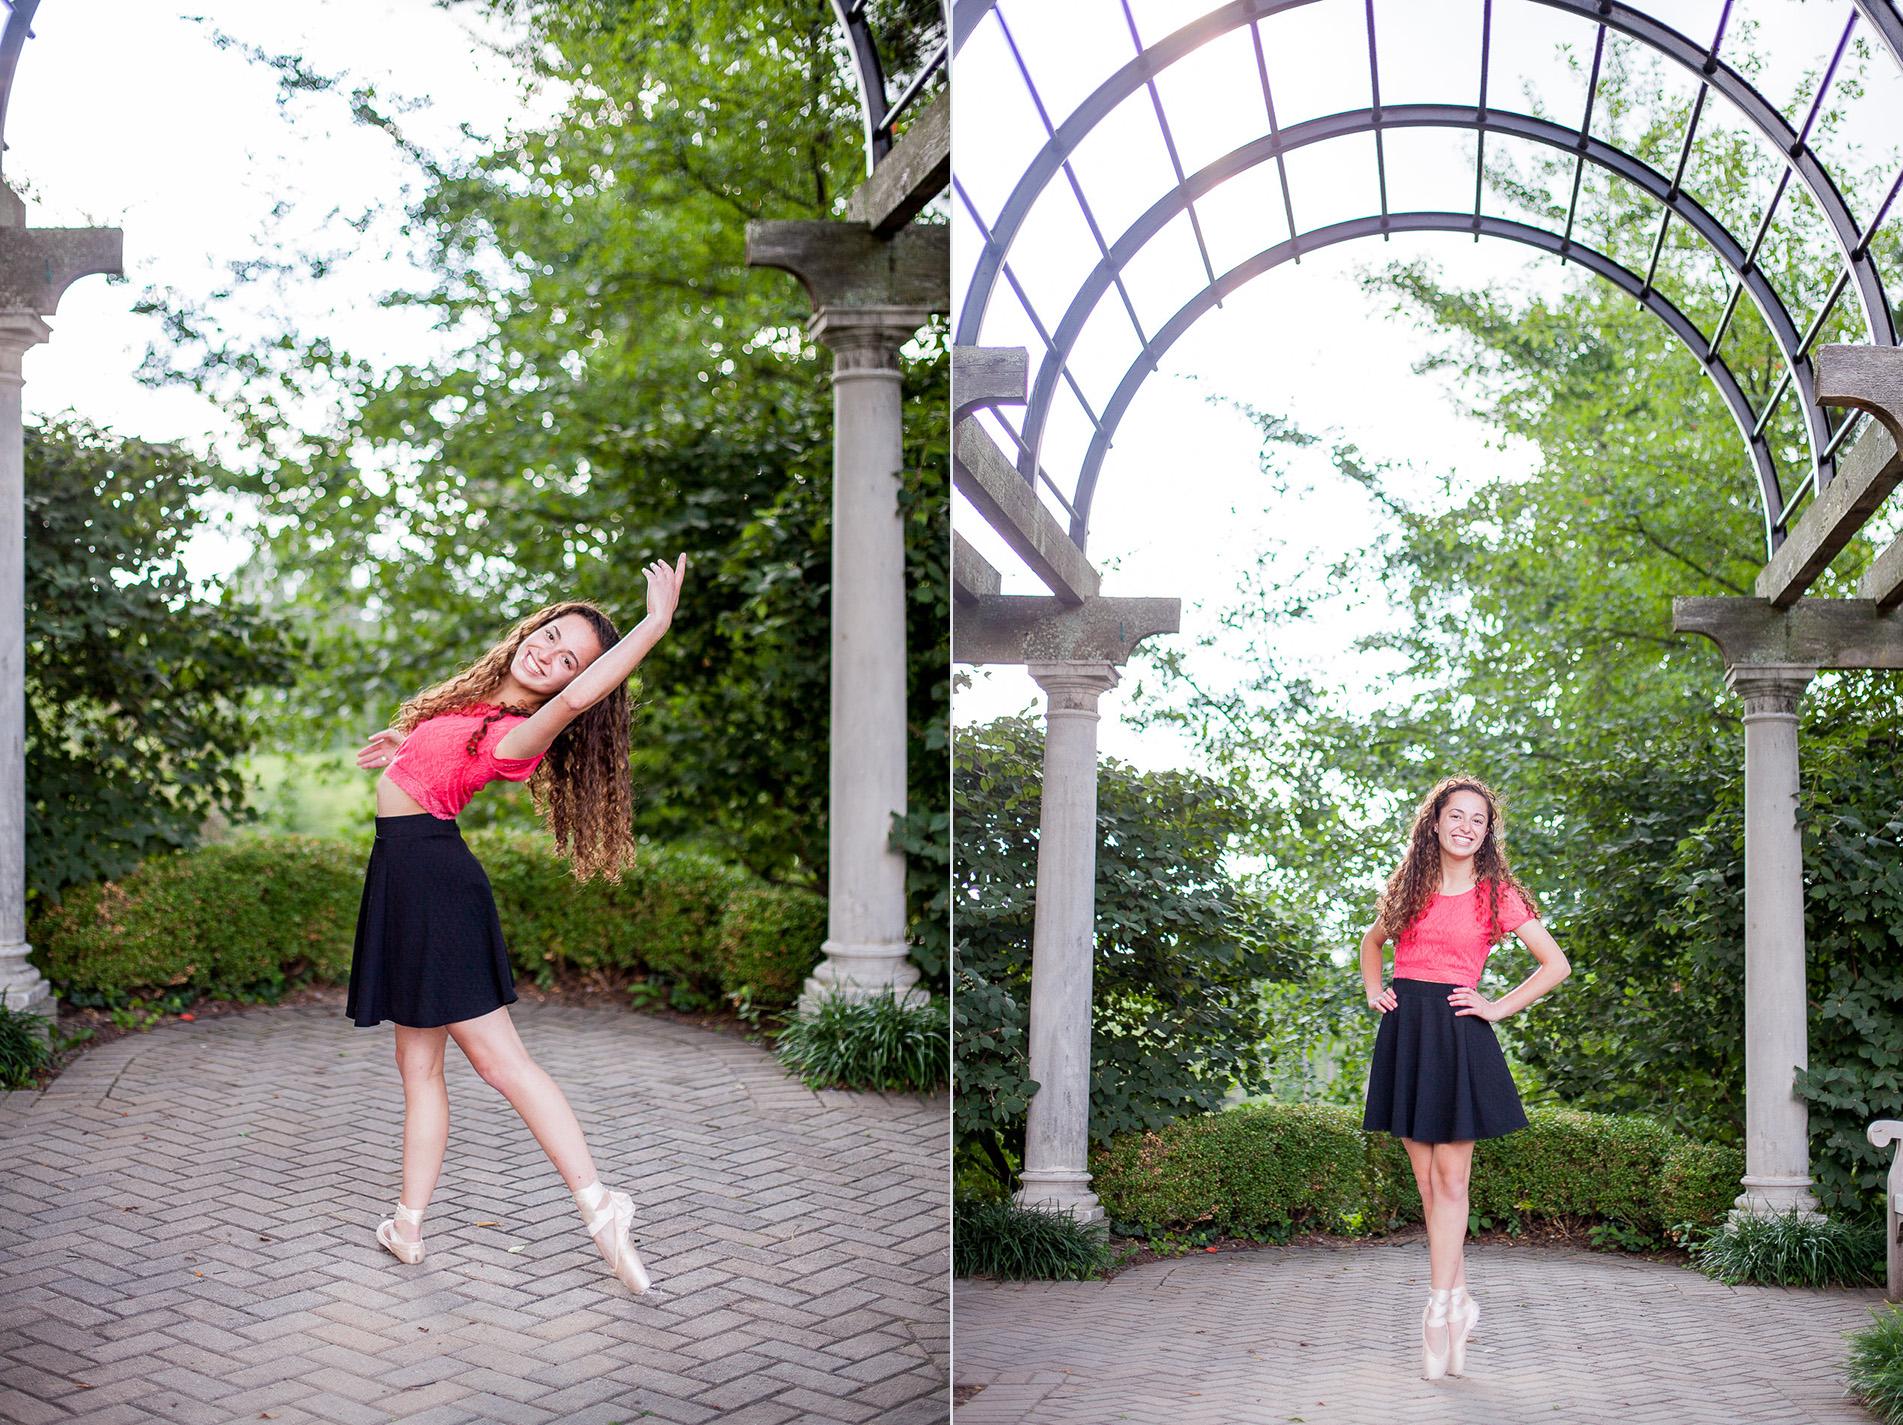 blog-15 copy.jpg